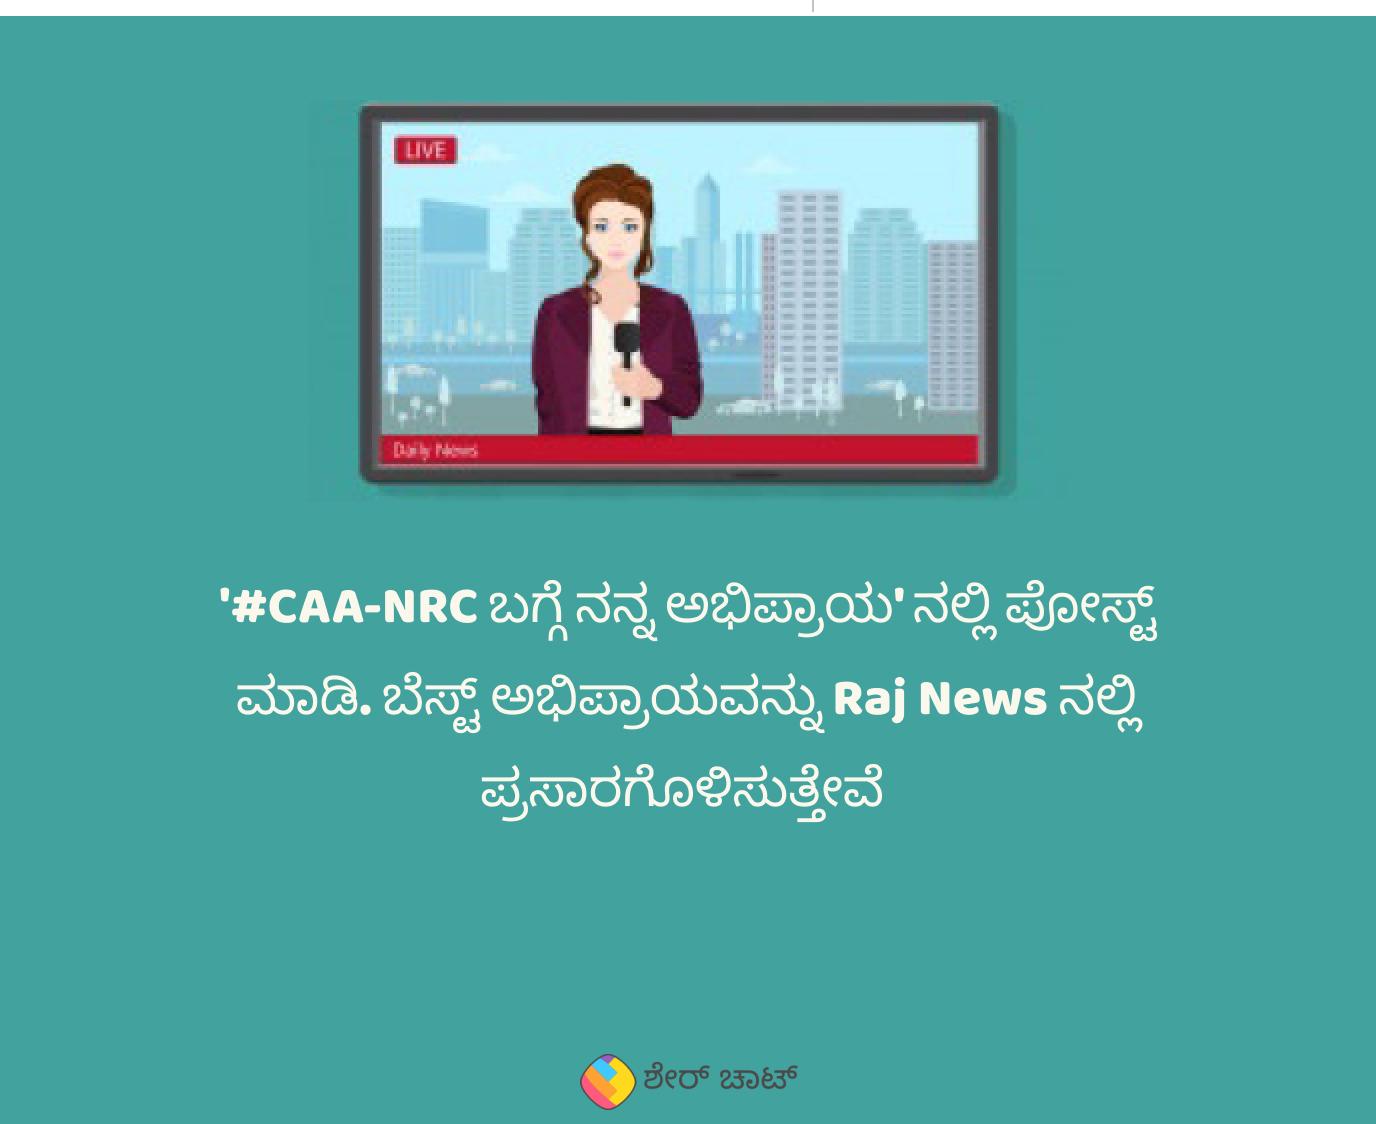 🎤CAA-NRC ಬಗ್ಗೆ ನನ್ನ ಅಭಿಪ್ರಾಯ - LIVE # CAA - NRCಬಗ್ಗೆ ನನ್ನ ಅಭಿಪ್ರಾಯ ' ನಲ್ಲಿ ಪೋಸ್ಟ್ ಮಾಡಿ . ಬೆಸ್ಟ್ ಅಭಿಪ್ರಾಯವನ್ನು Raj News ನಲ್ಲಿ ಪ್ರಸಾರಗೊಳಿಸುತ್ತೇವೆ ಶೇರ್ ಚಾಟ್ - ShareChat